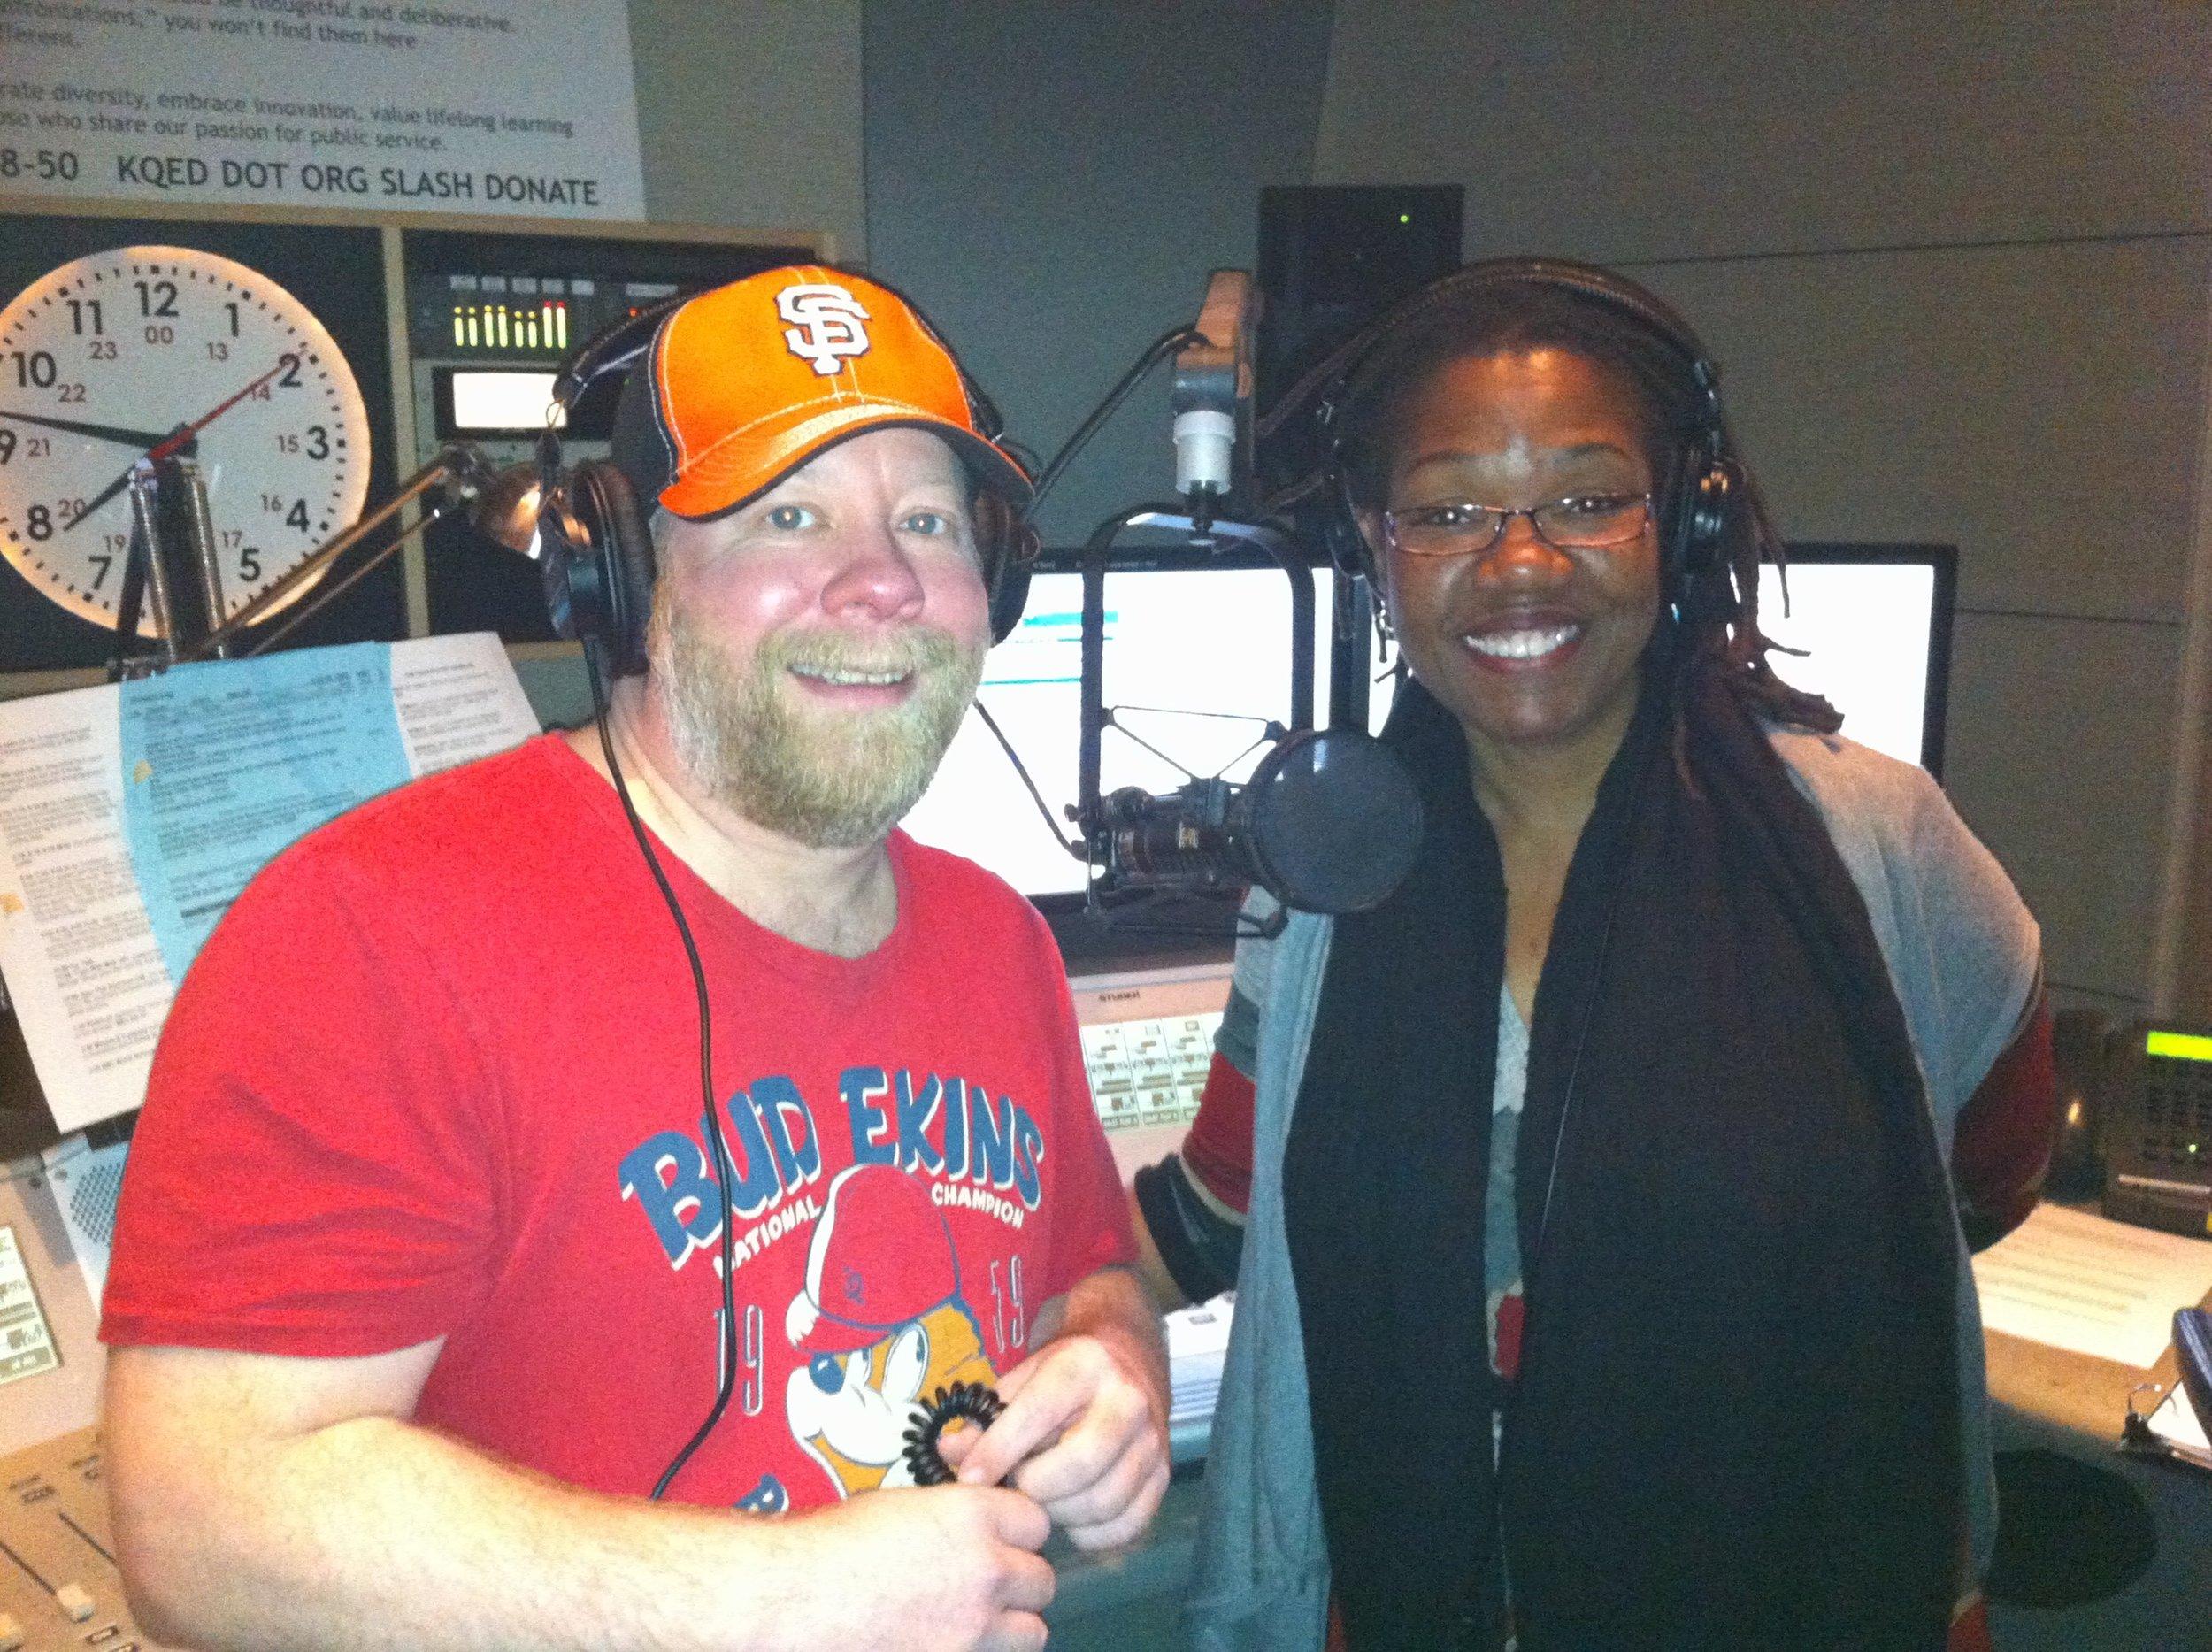 Bud Gundy and Michelle Henagan on KQED radio.